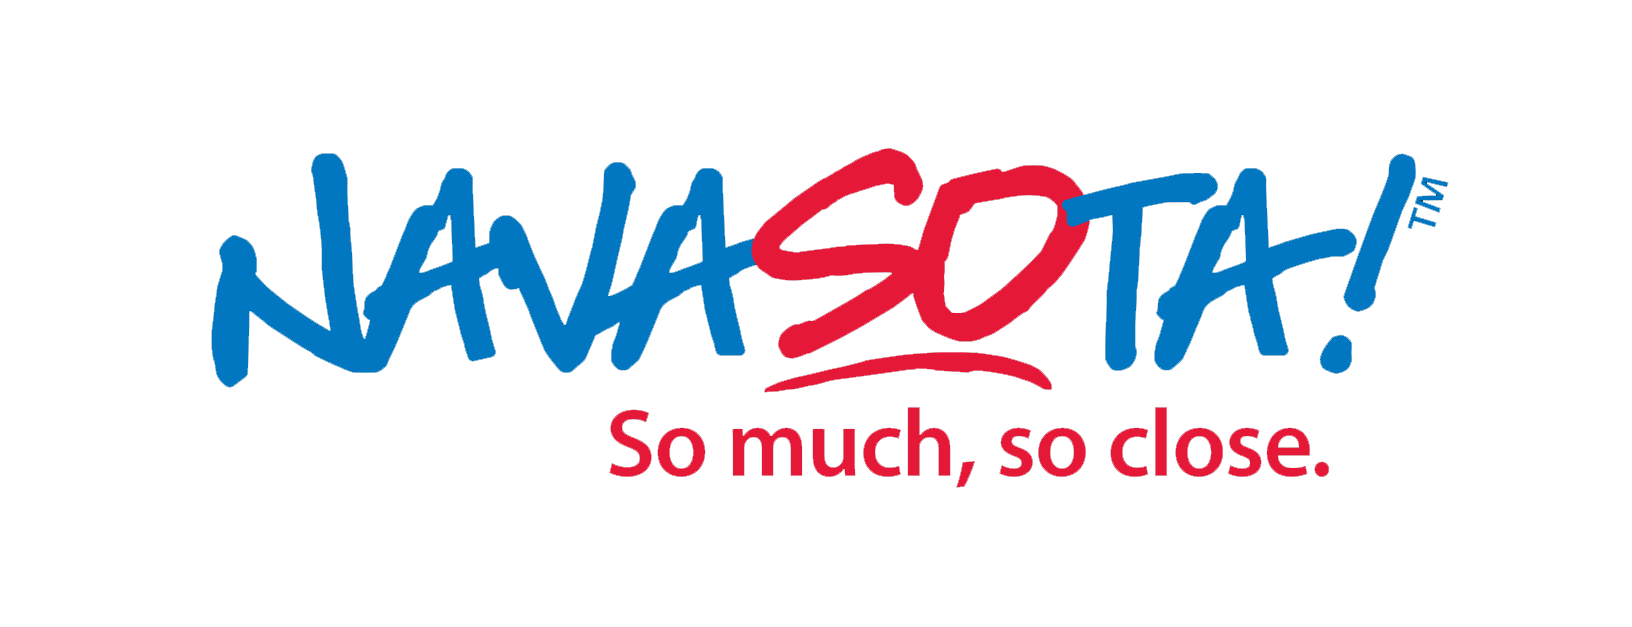 Navasota, Texas - Logo